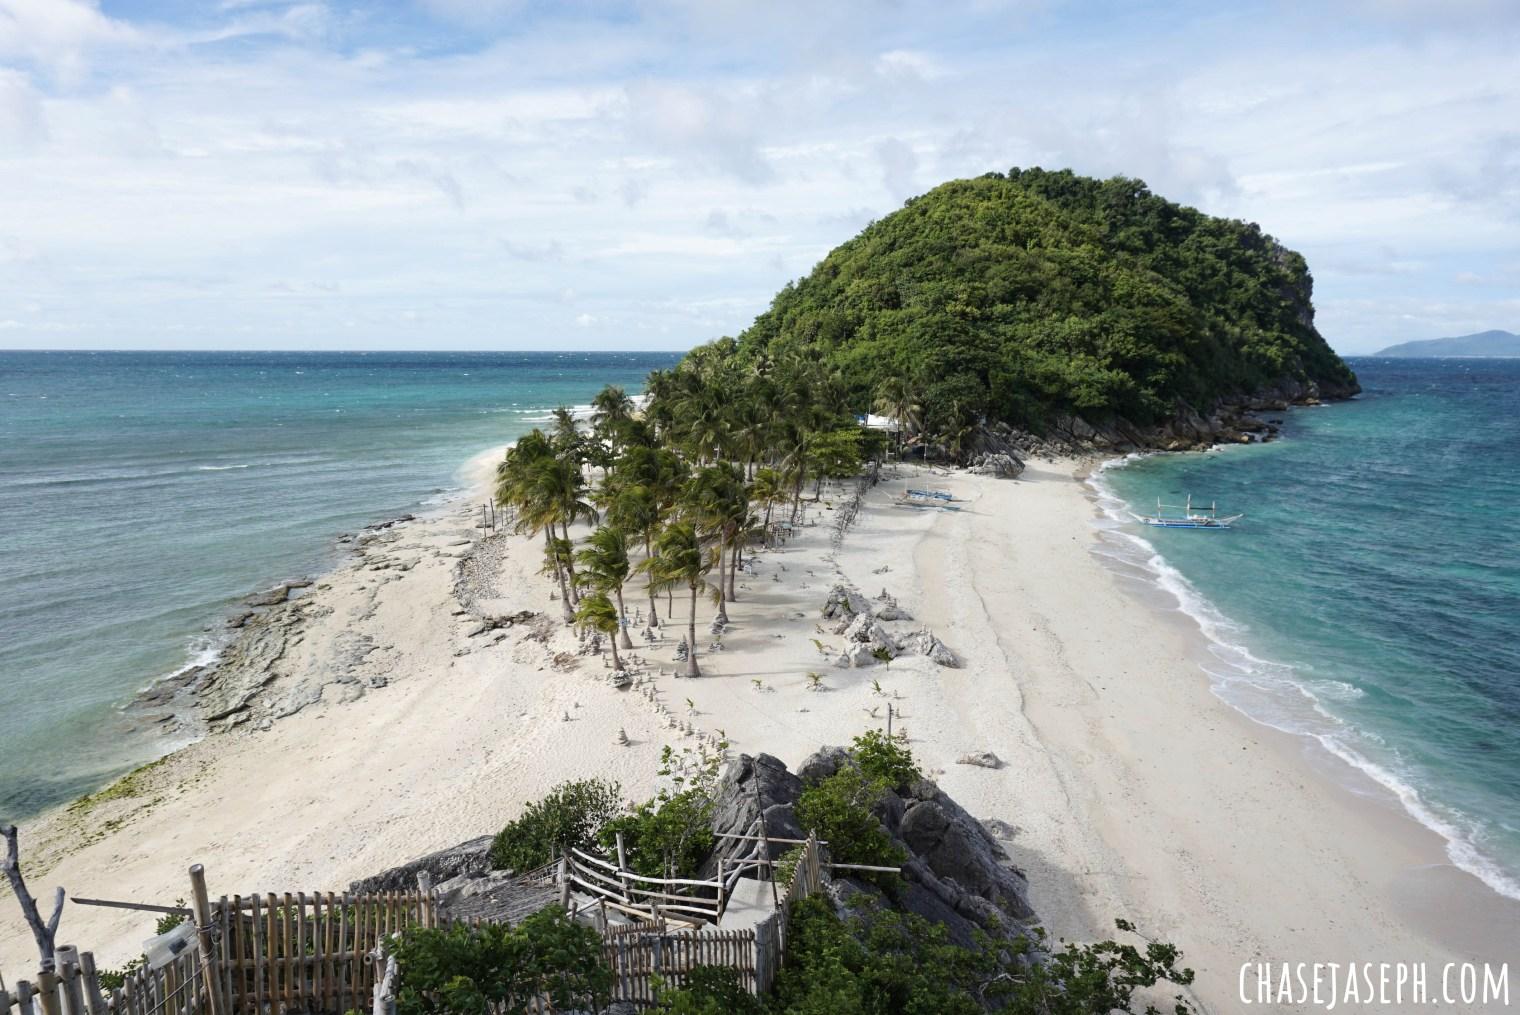 Gigantes Islands - Carles, Iloilo (Travel Guide)